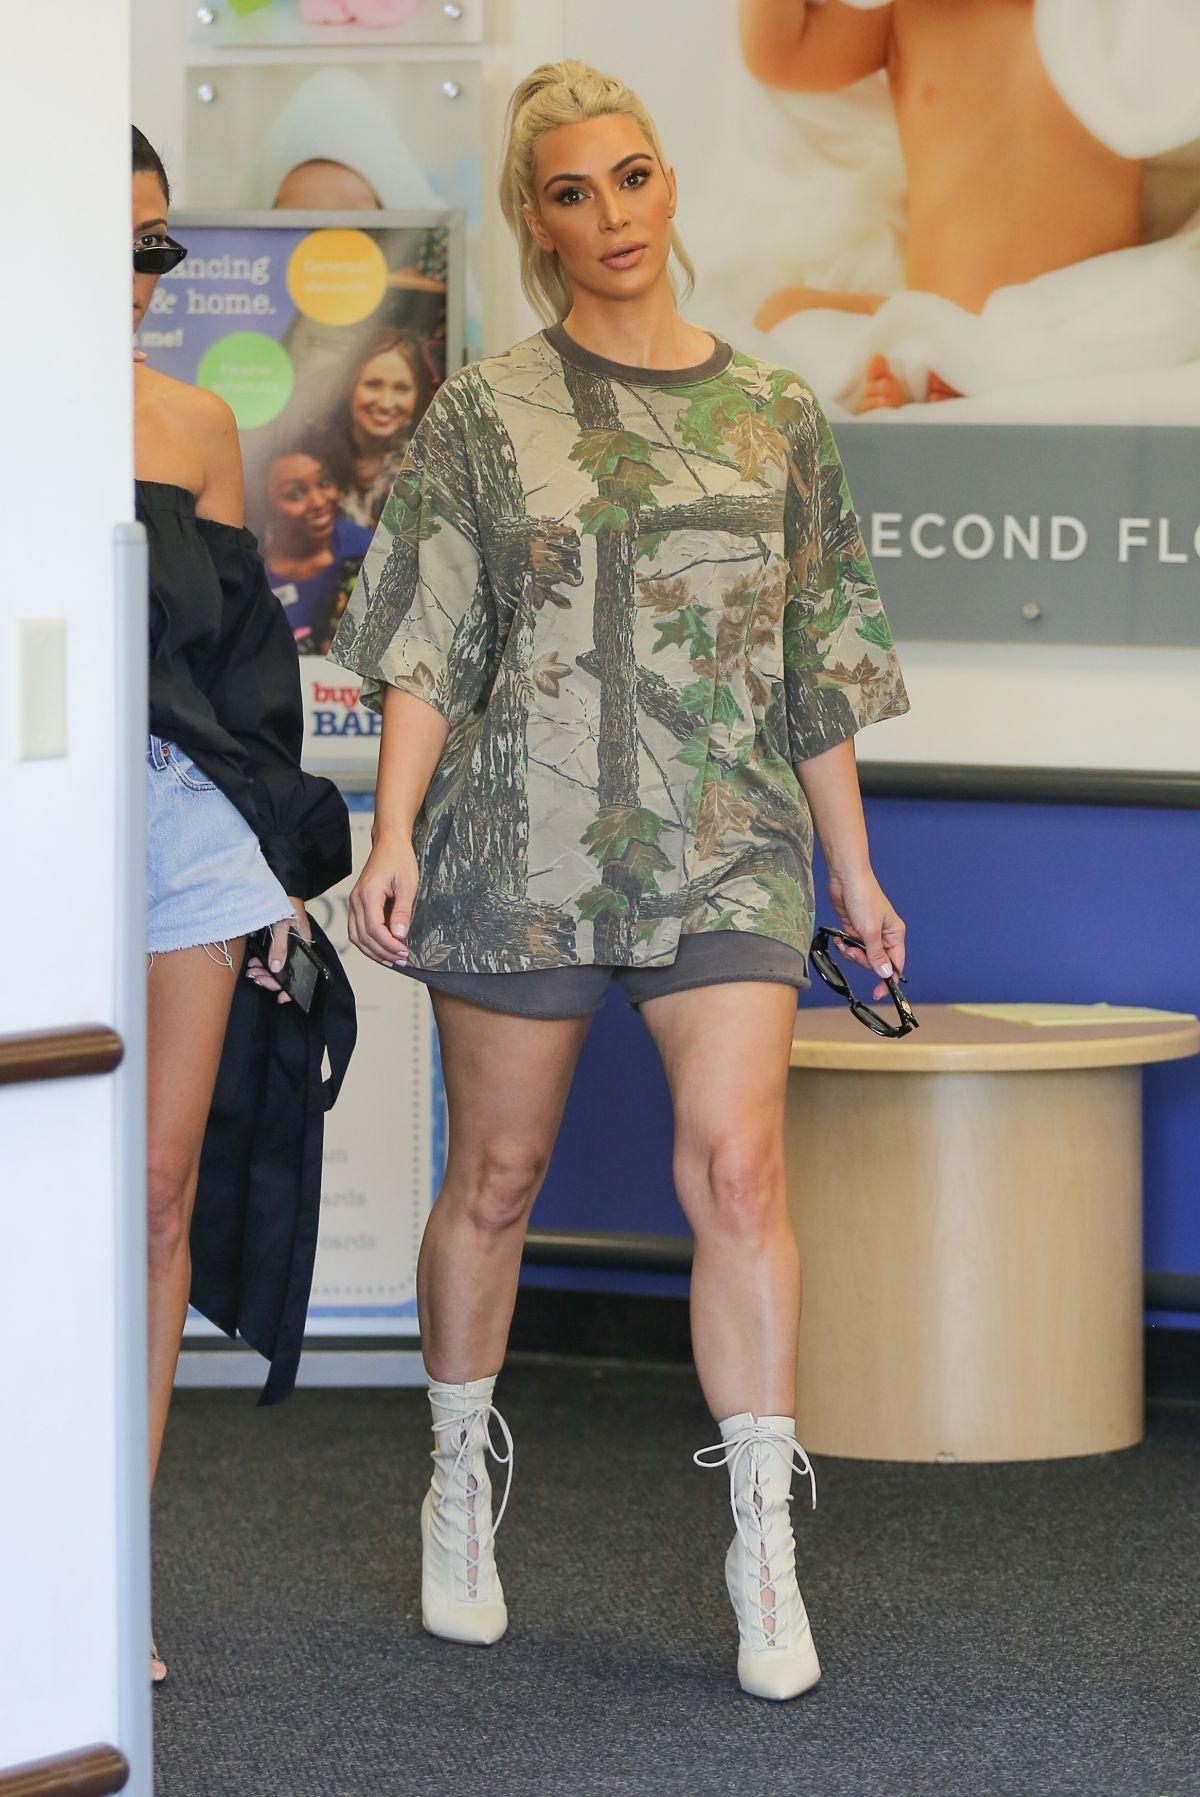 Kim And Kourtney Kardashian Shopping At Bbuybuy Baby In Calabasas 10